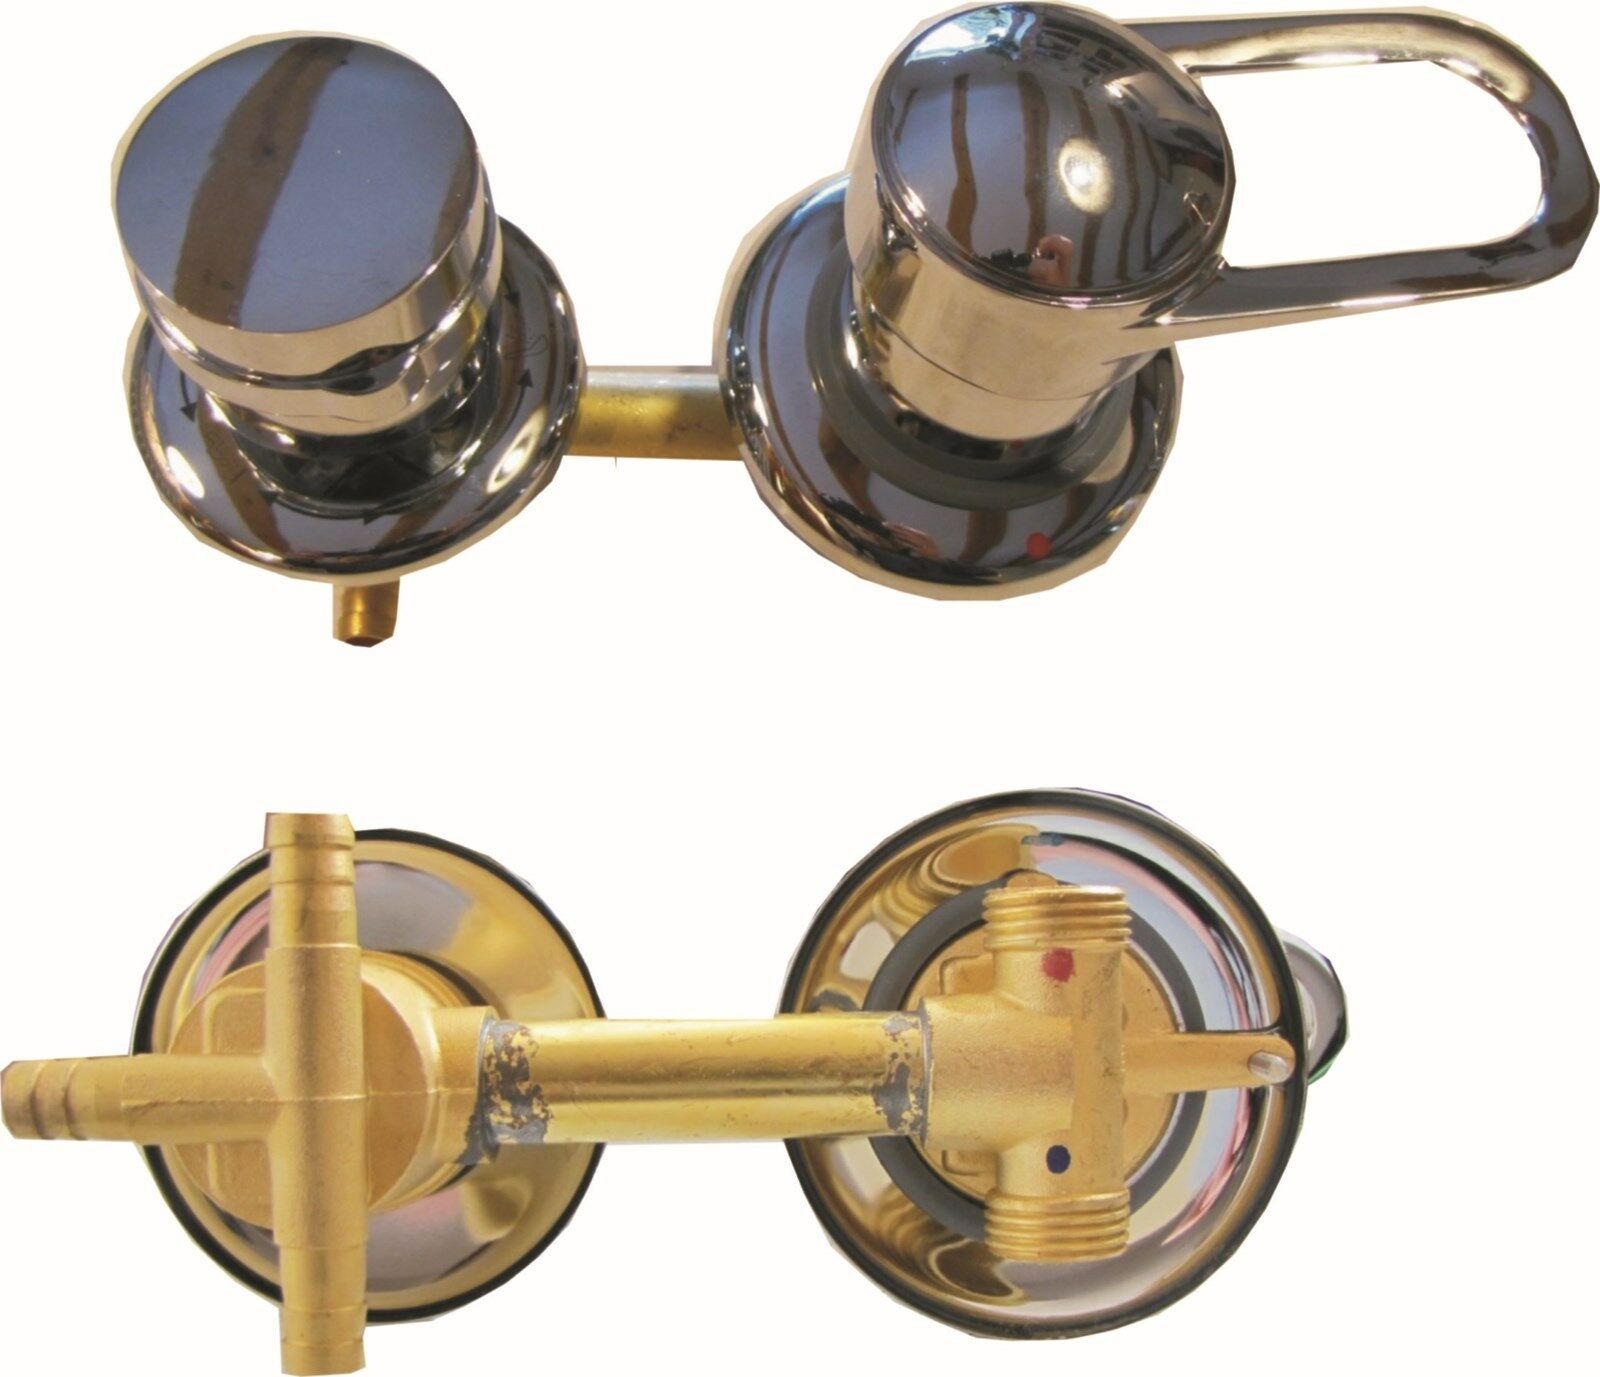 Armatur Einhebelmischer 12,5 cm 3 fach Umschalter Duschkabine Duschtempel Dusche